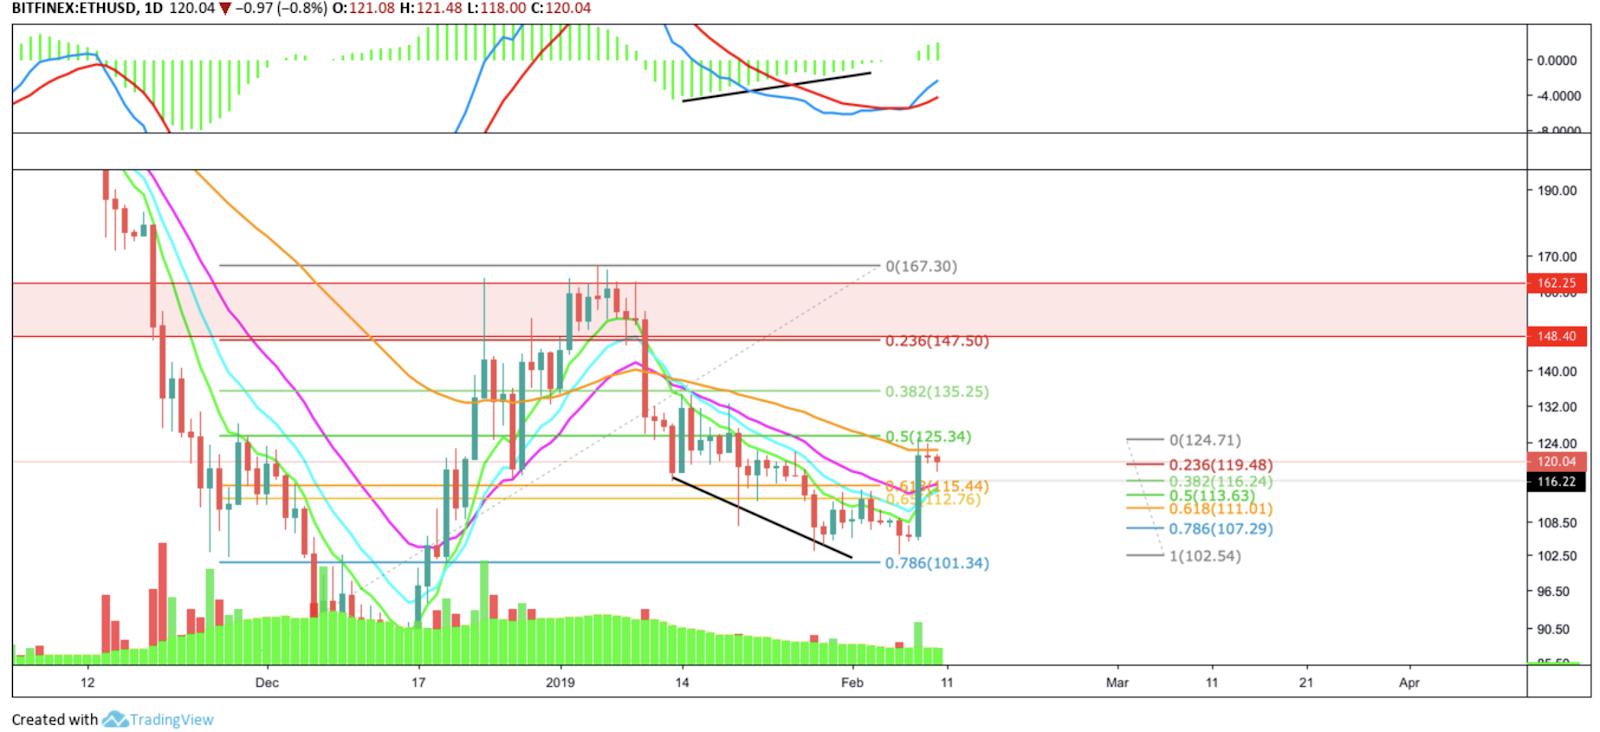 ETH/USD, Daily Chart